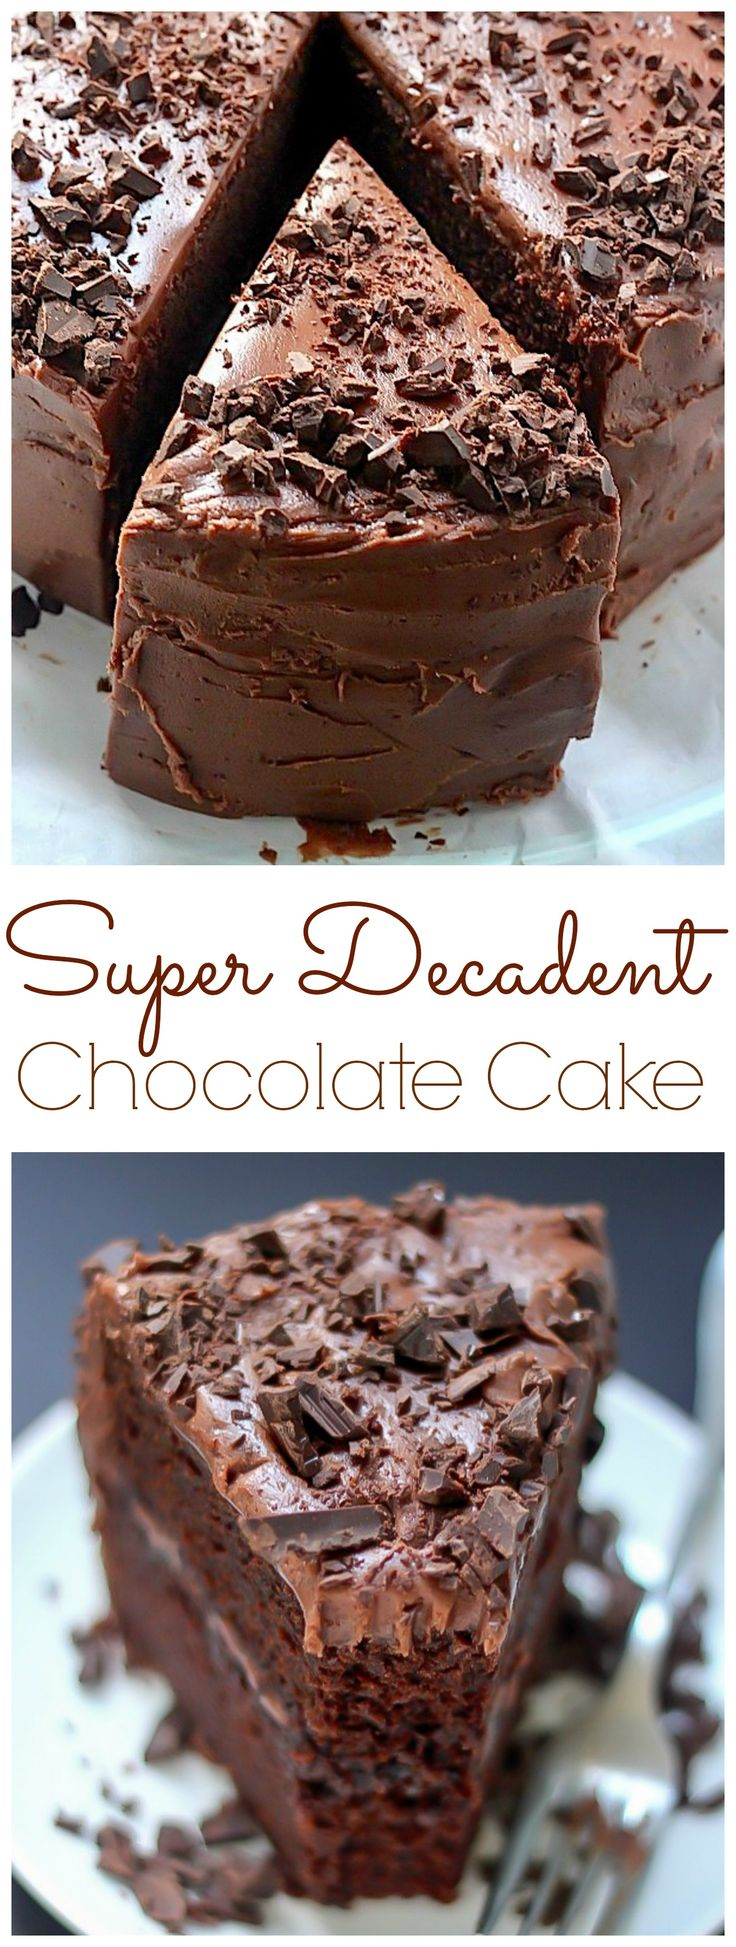 Super Decadent Chocolate Cake With Fudge Frosting Recipe - (bakerbynature)